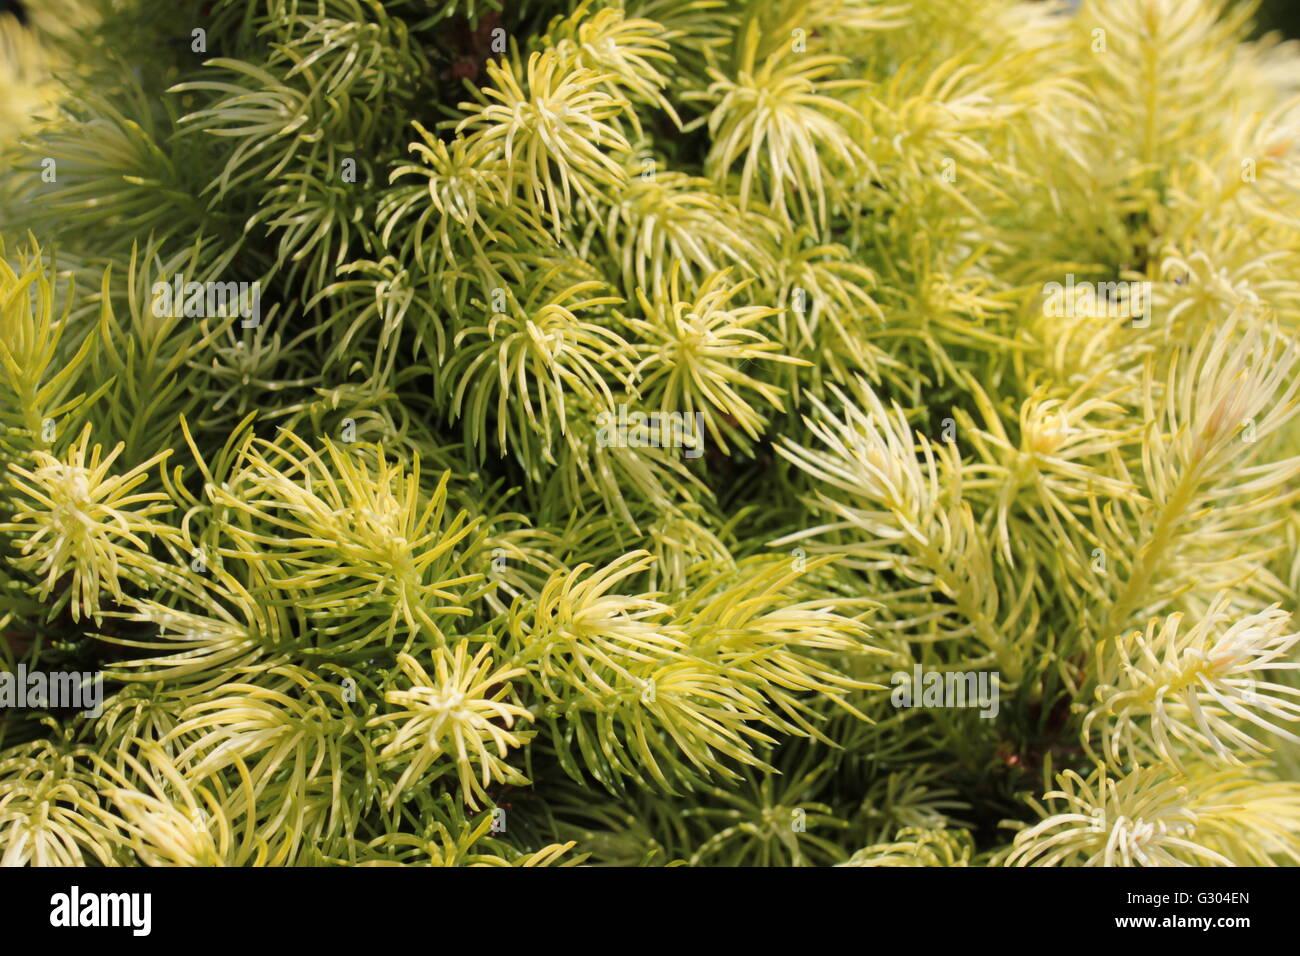 Thuja orientalis golden tree - Stock Image